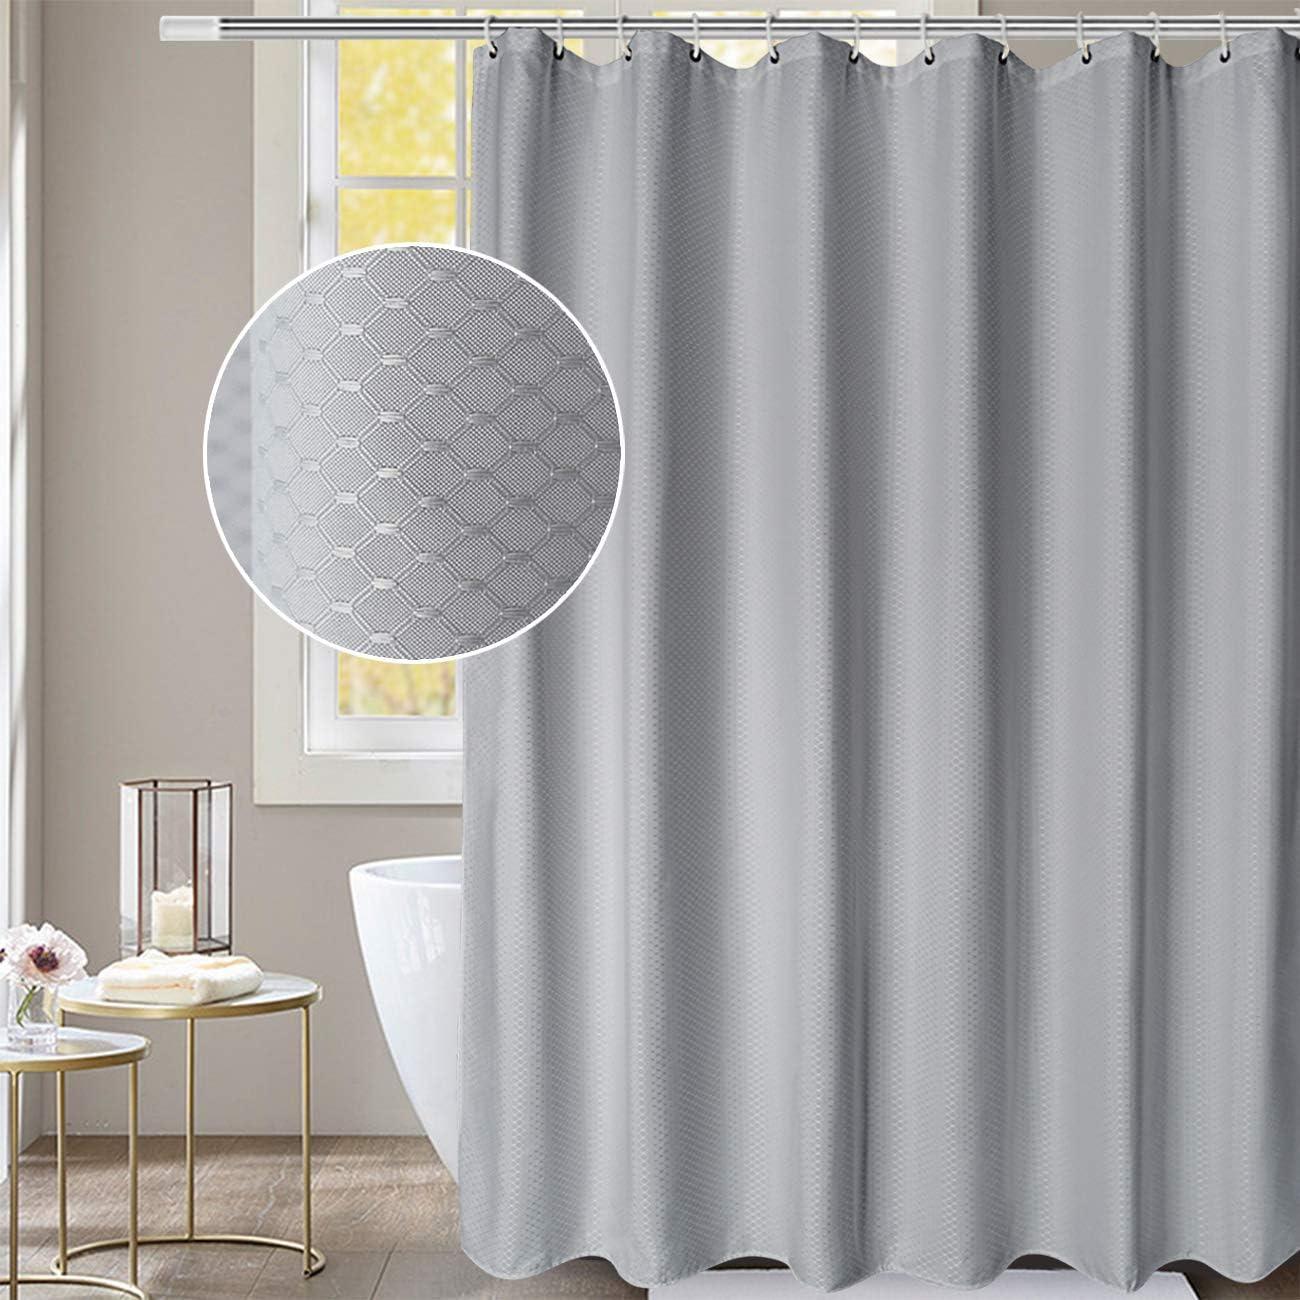 72 x 80, Yuunity Shower Curtain Polyester Fabric Washable Waterproof Eco-Friendly Washable Hotel Quality Grey 72x80